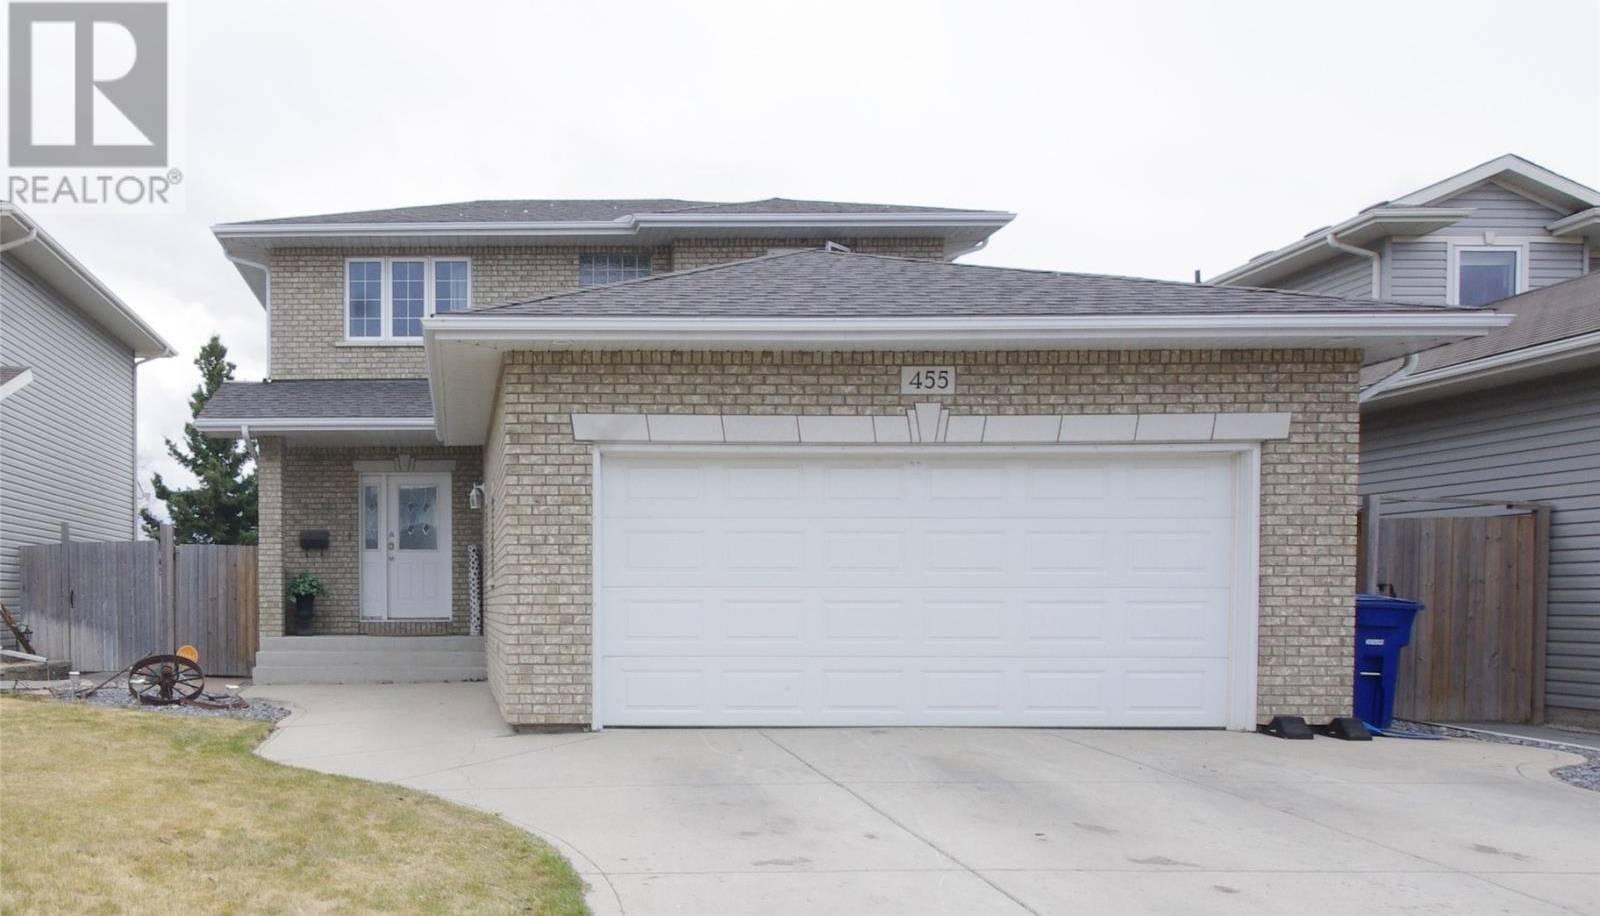 House for sale at 455 Buckwold Cv  Saskatoon Saskatchewan - MLS: SK770561